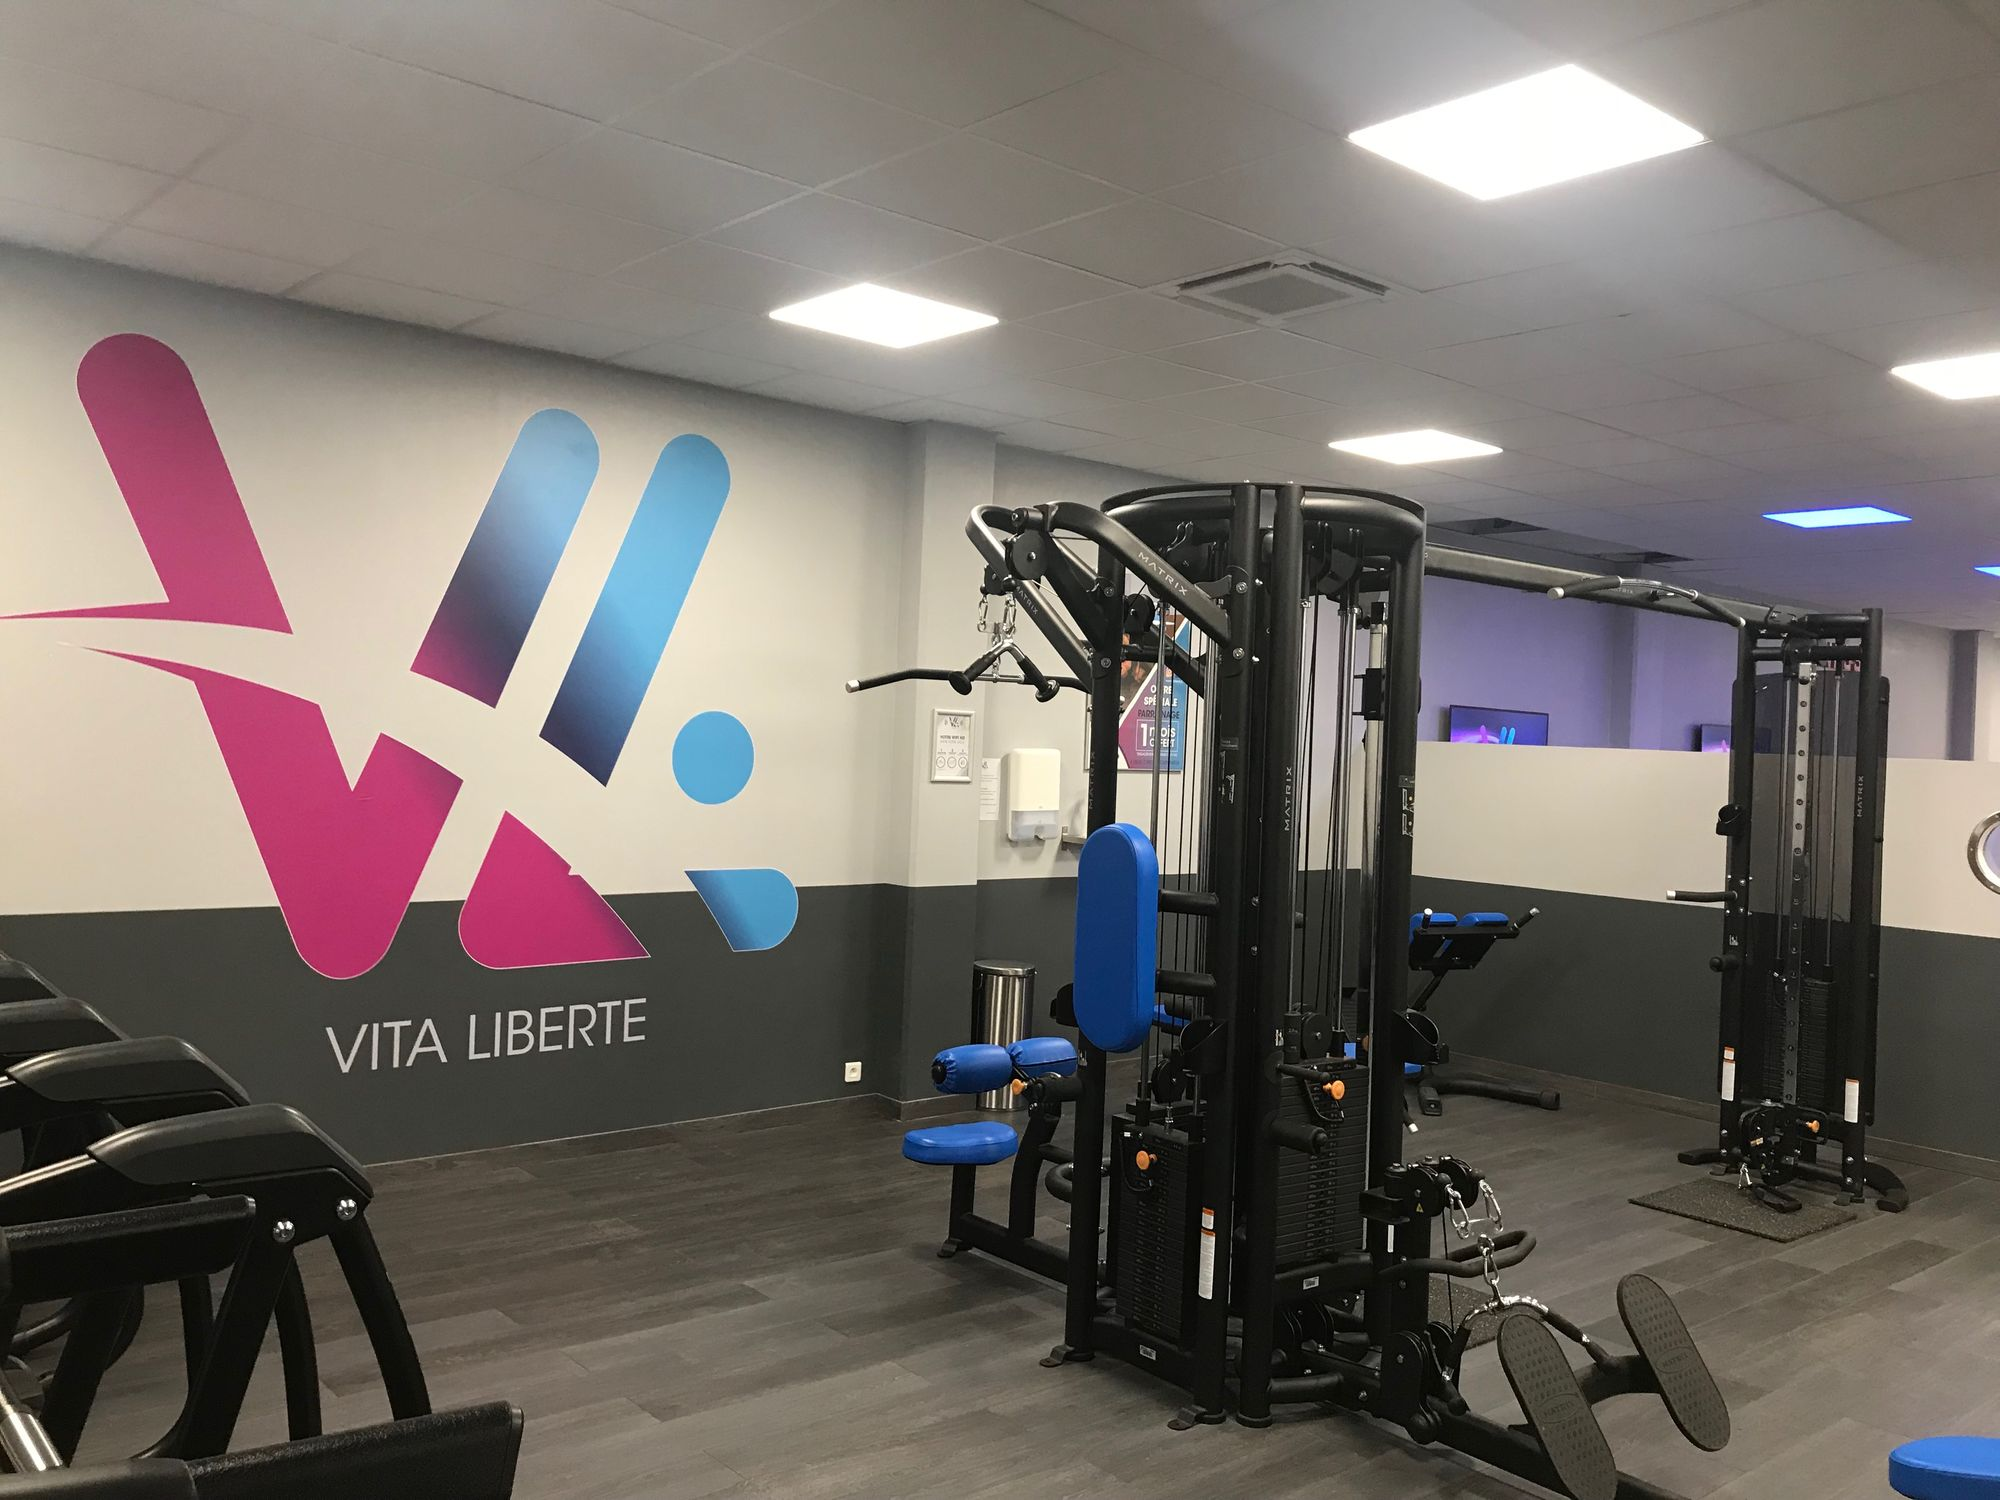 Salle de sport Vita liberté Martigues muscualtion